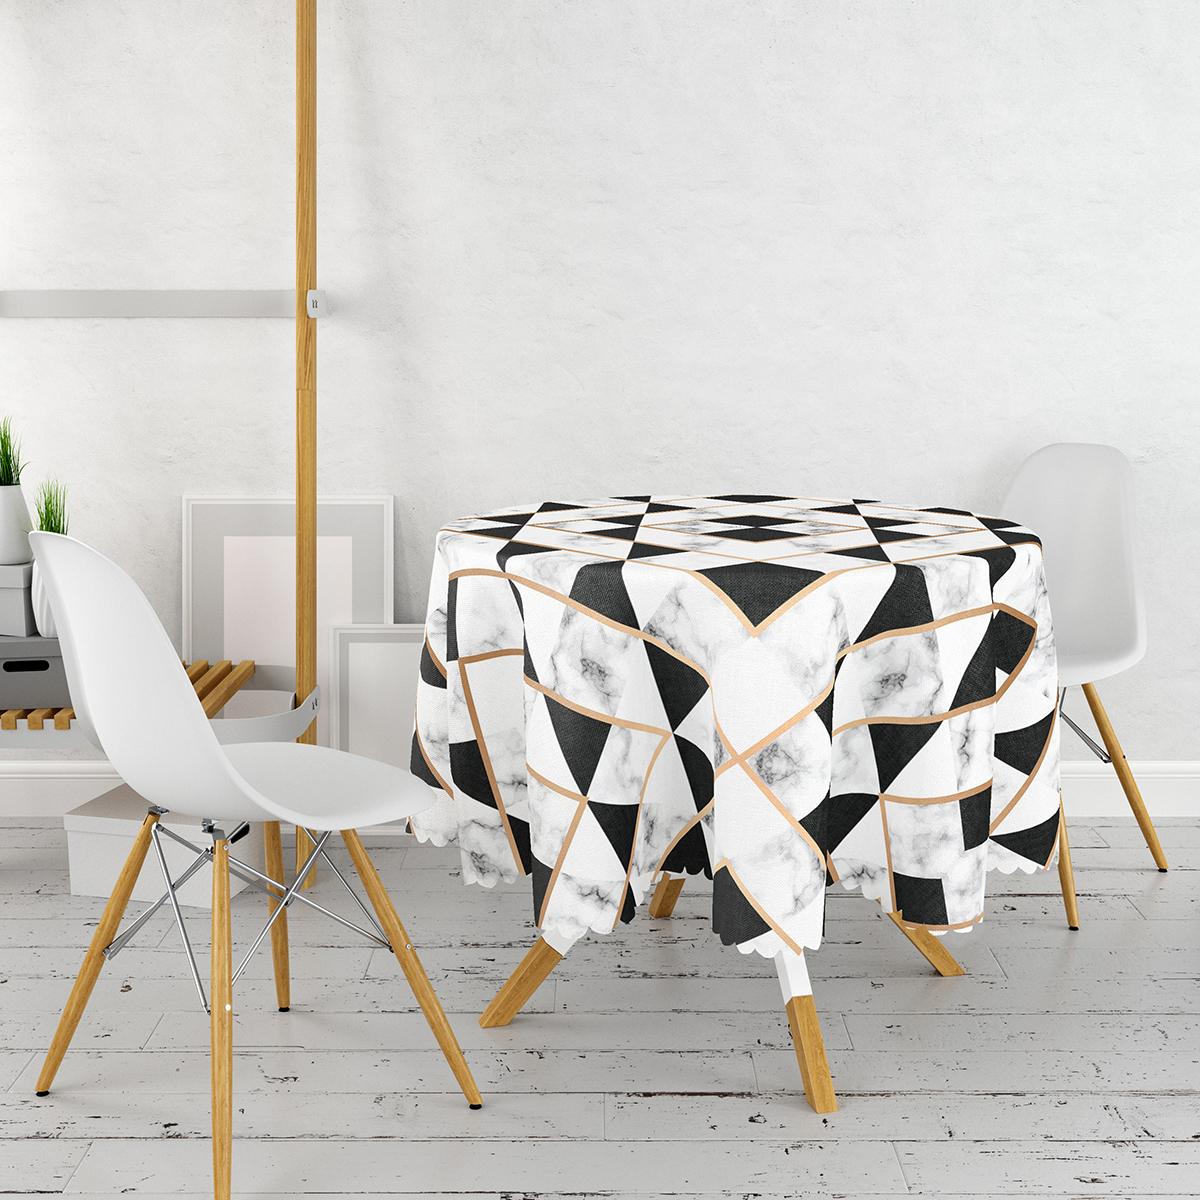 Siyah Mermer Tasarımlı Gold Detaylı Dijital Baskılı Yuvarlak Masa Örtüsü - Çap 140cm Realhomes